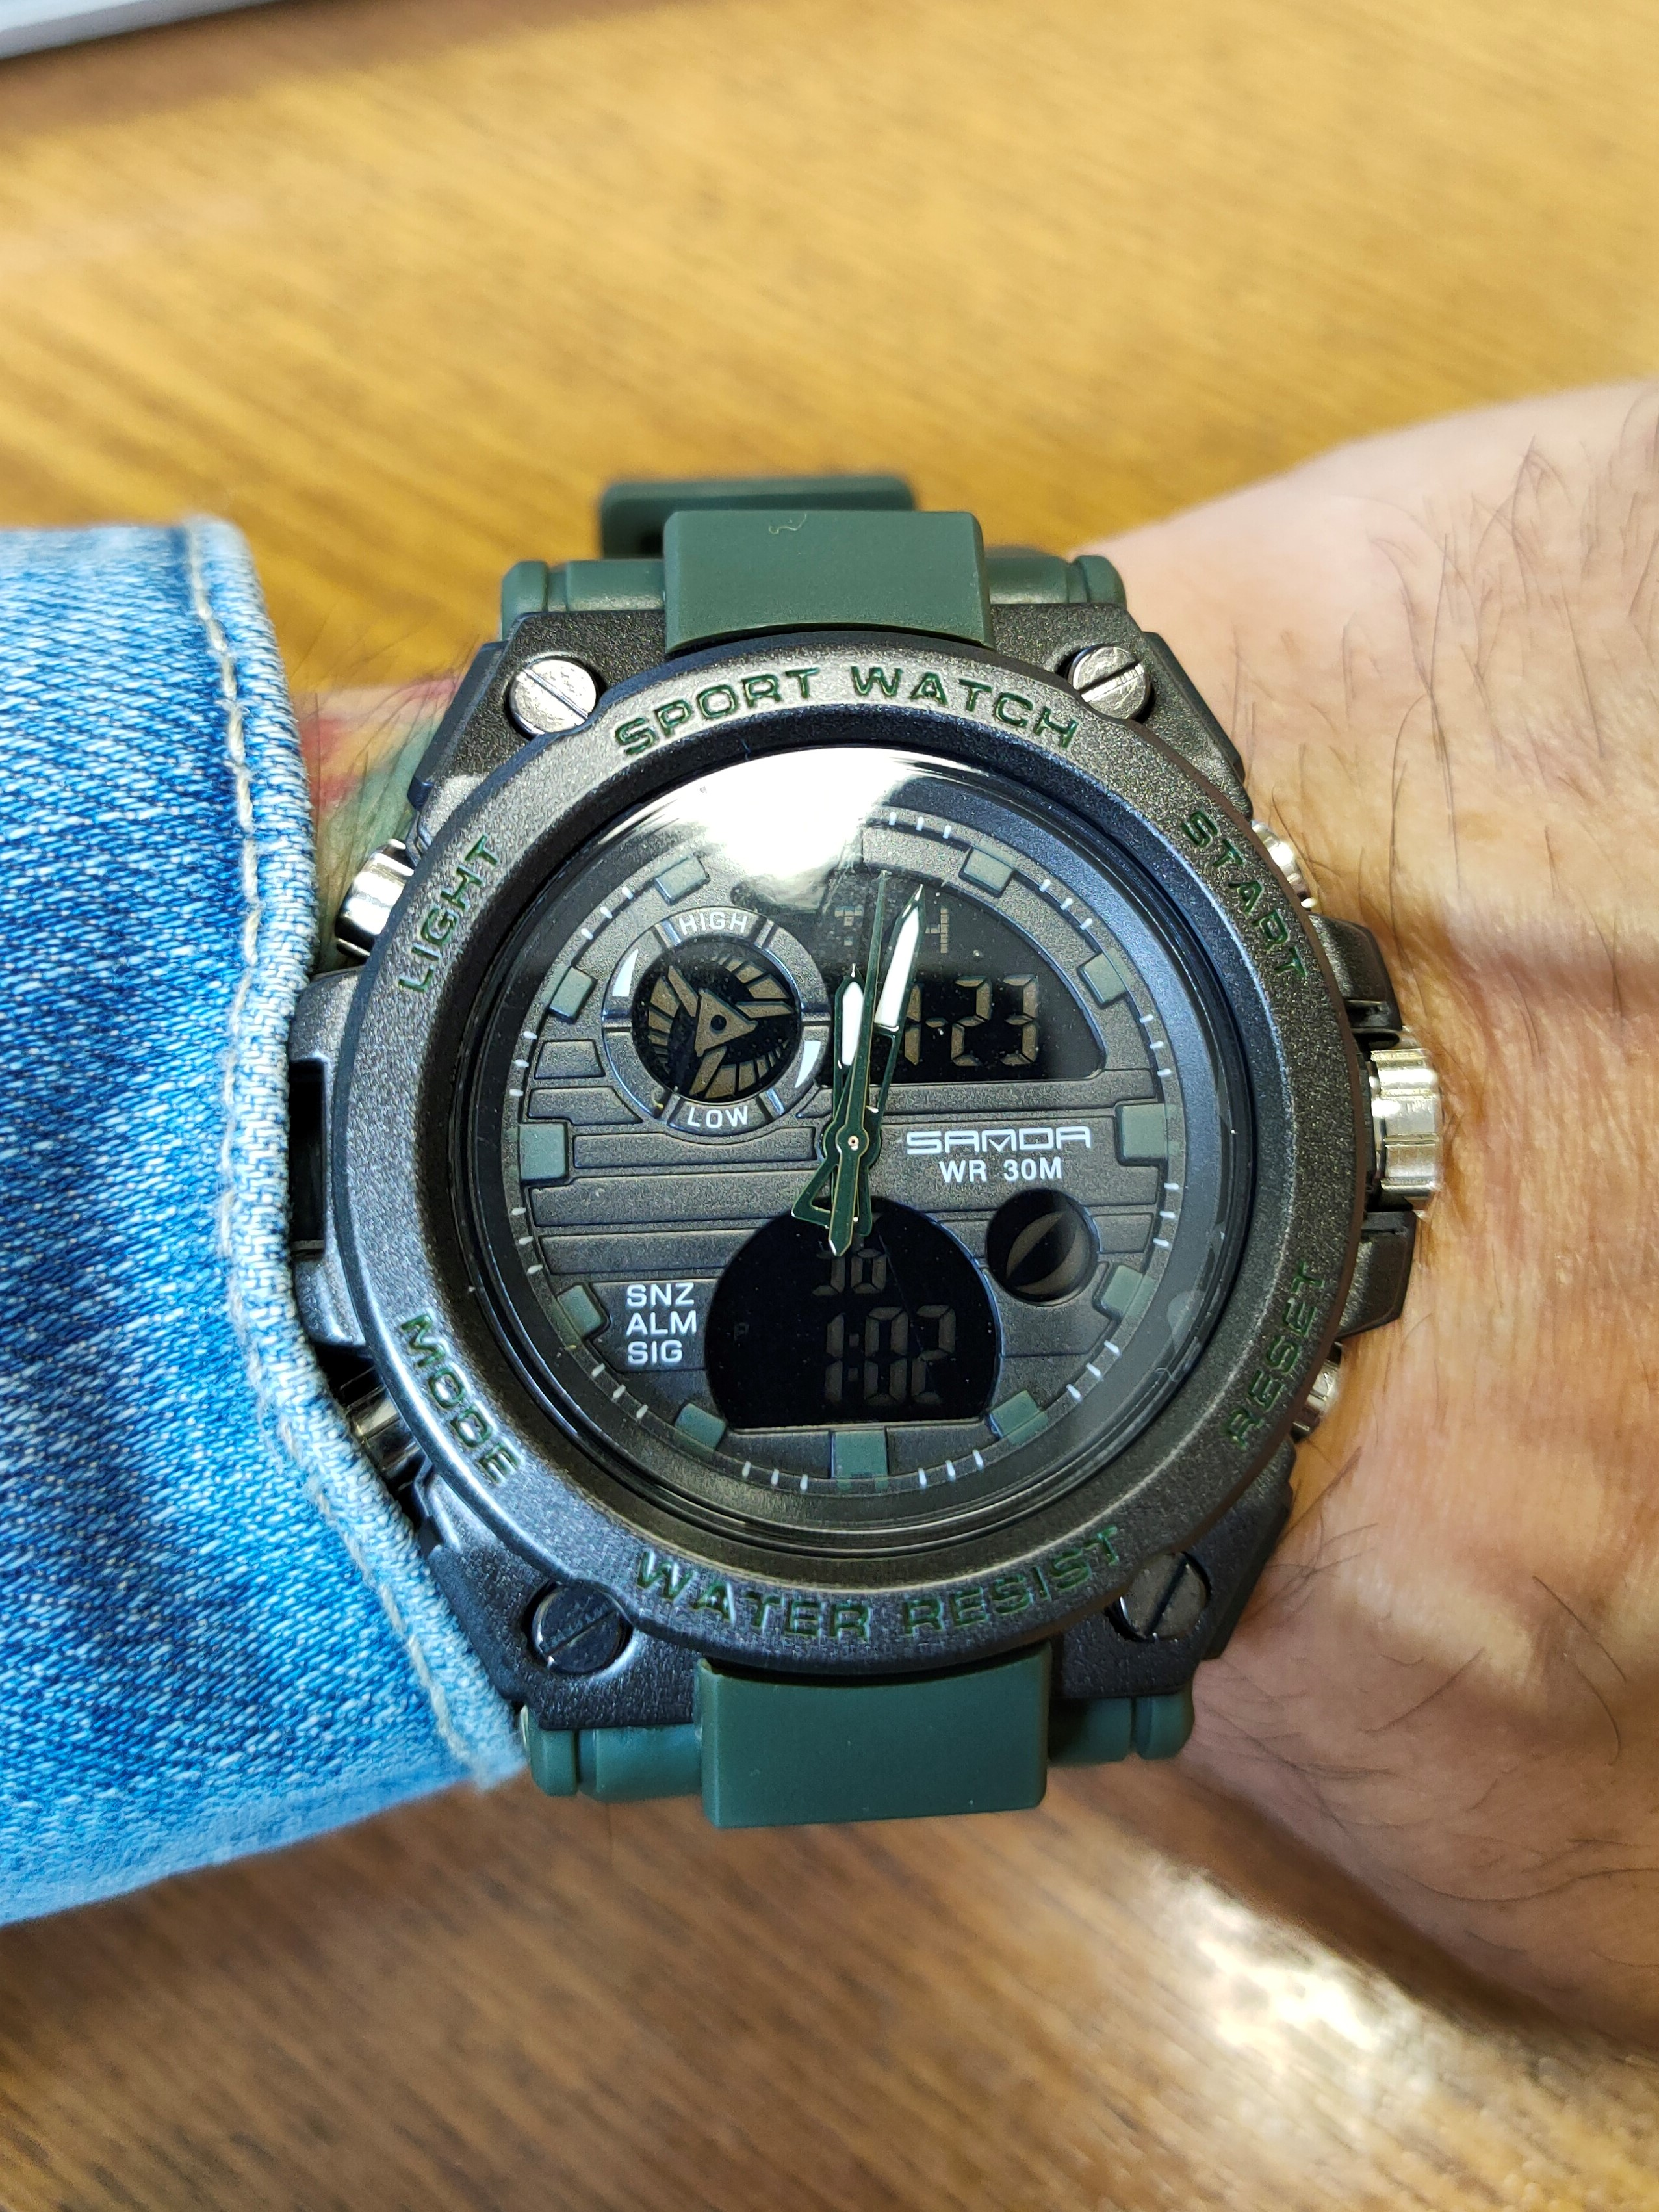 Relógio Masculino Militar Esporte Shock P739 photo review